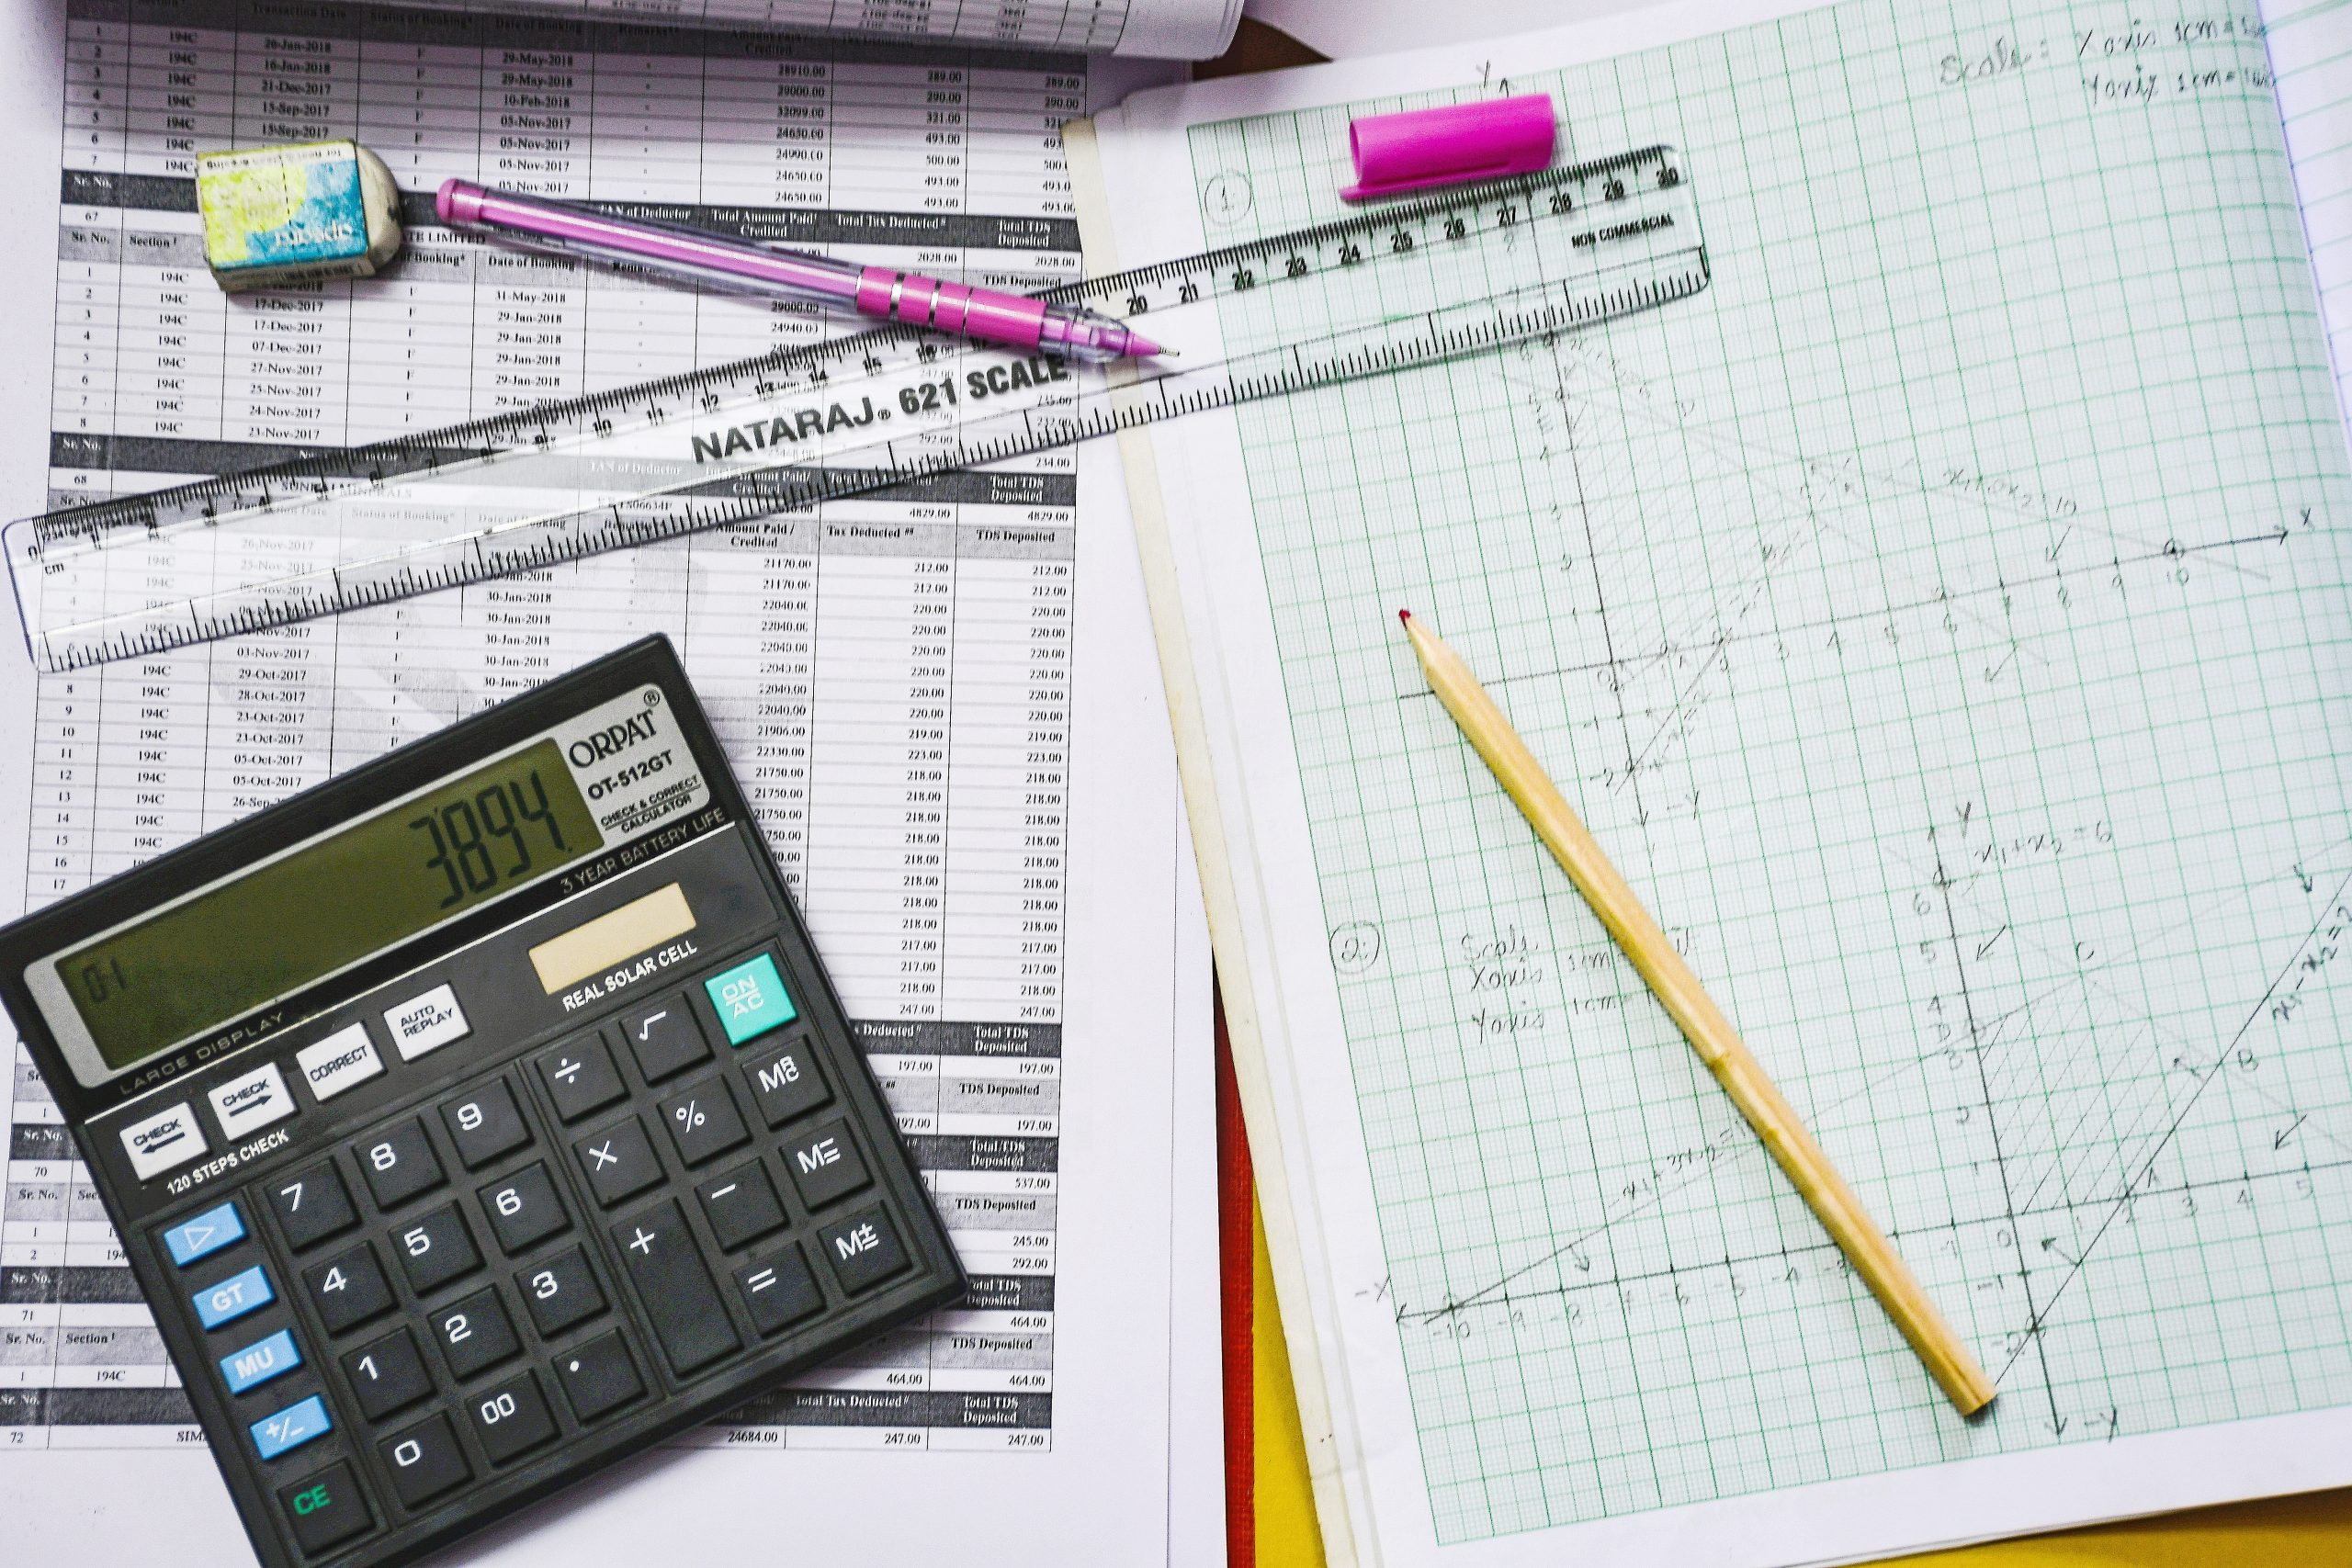 Complex calculation with a calculator